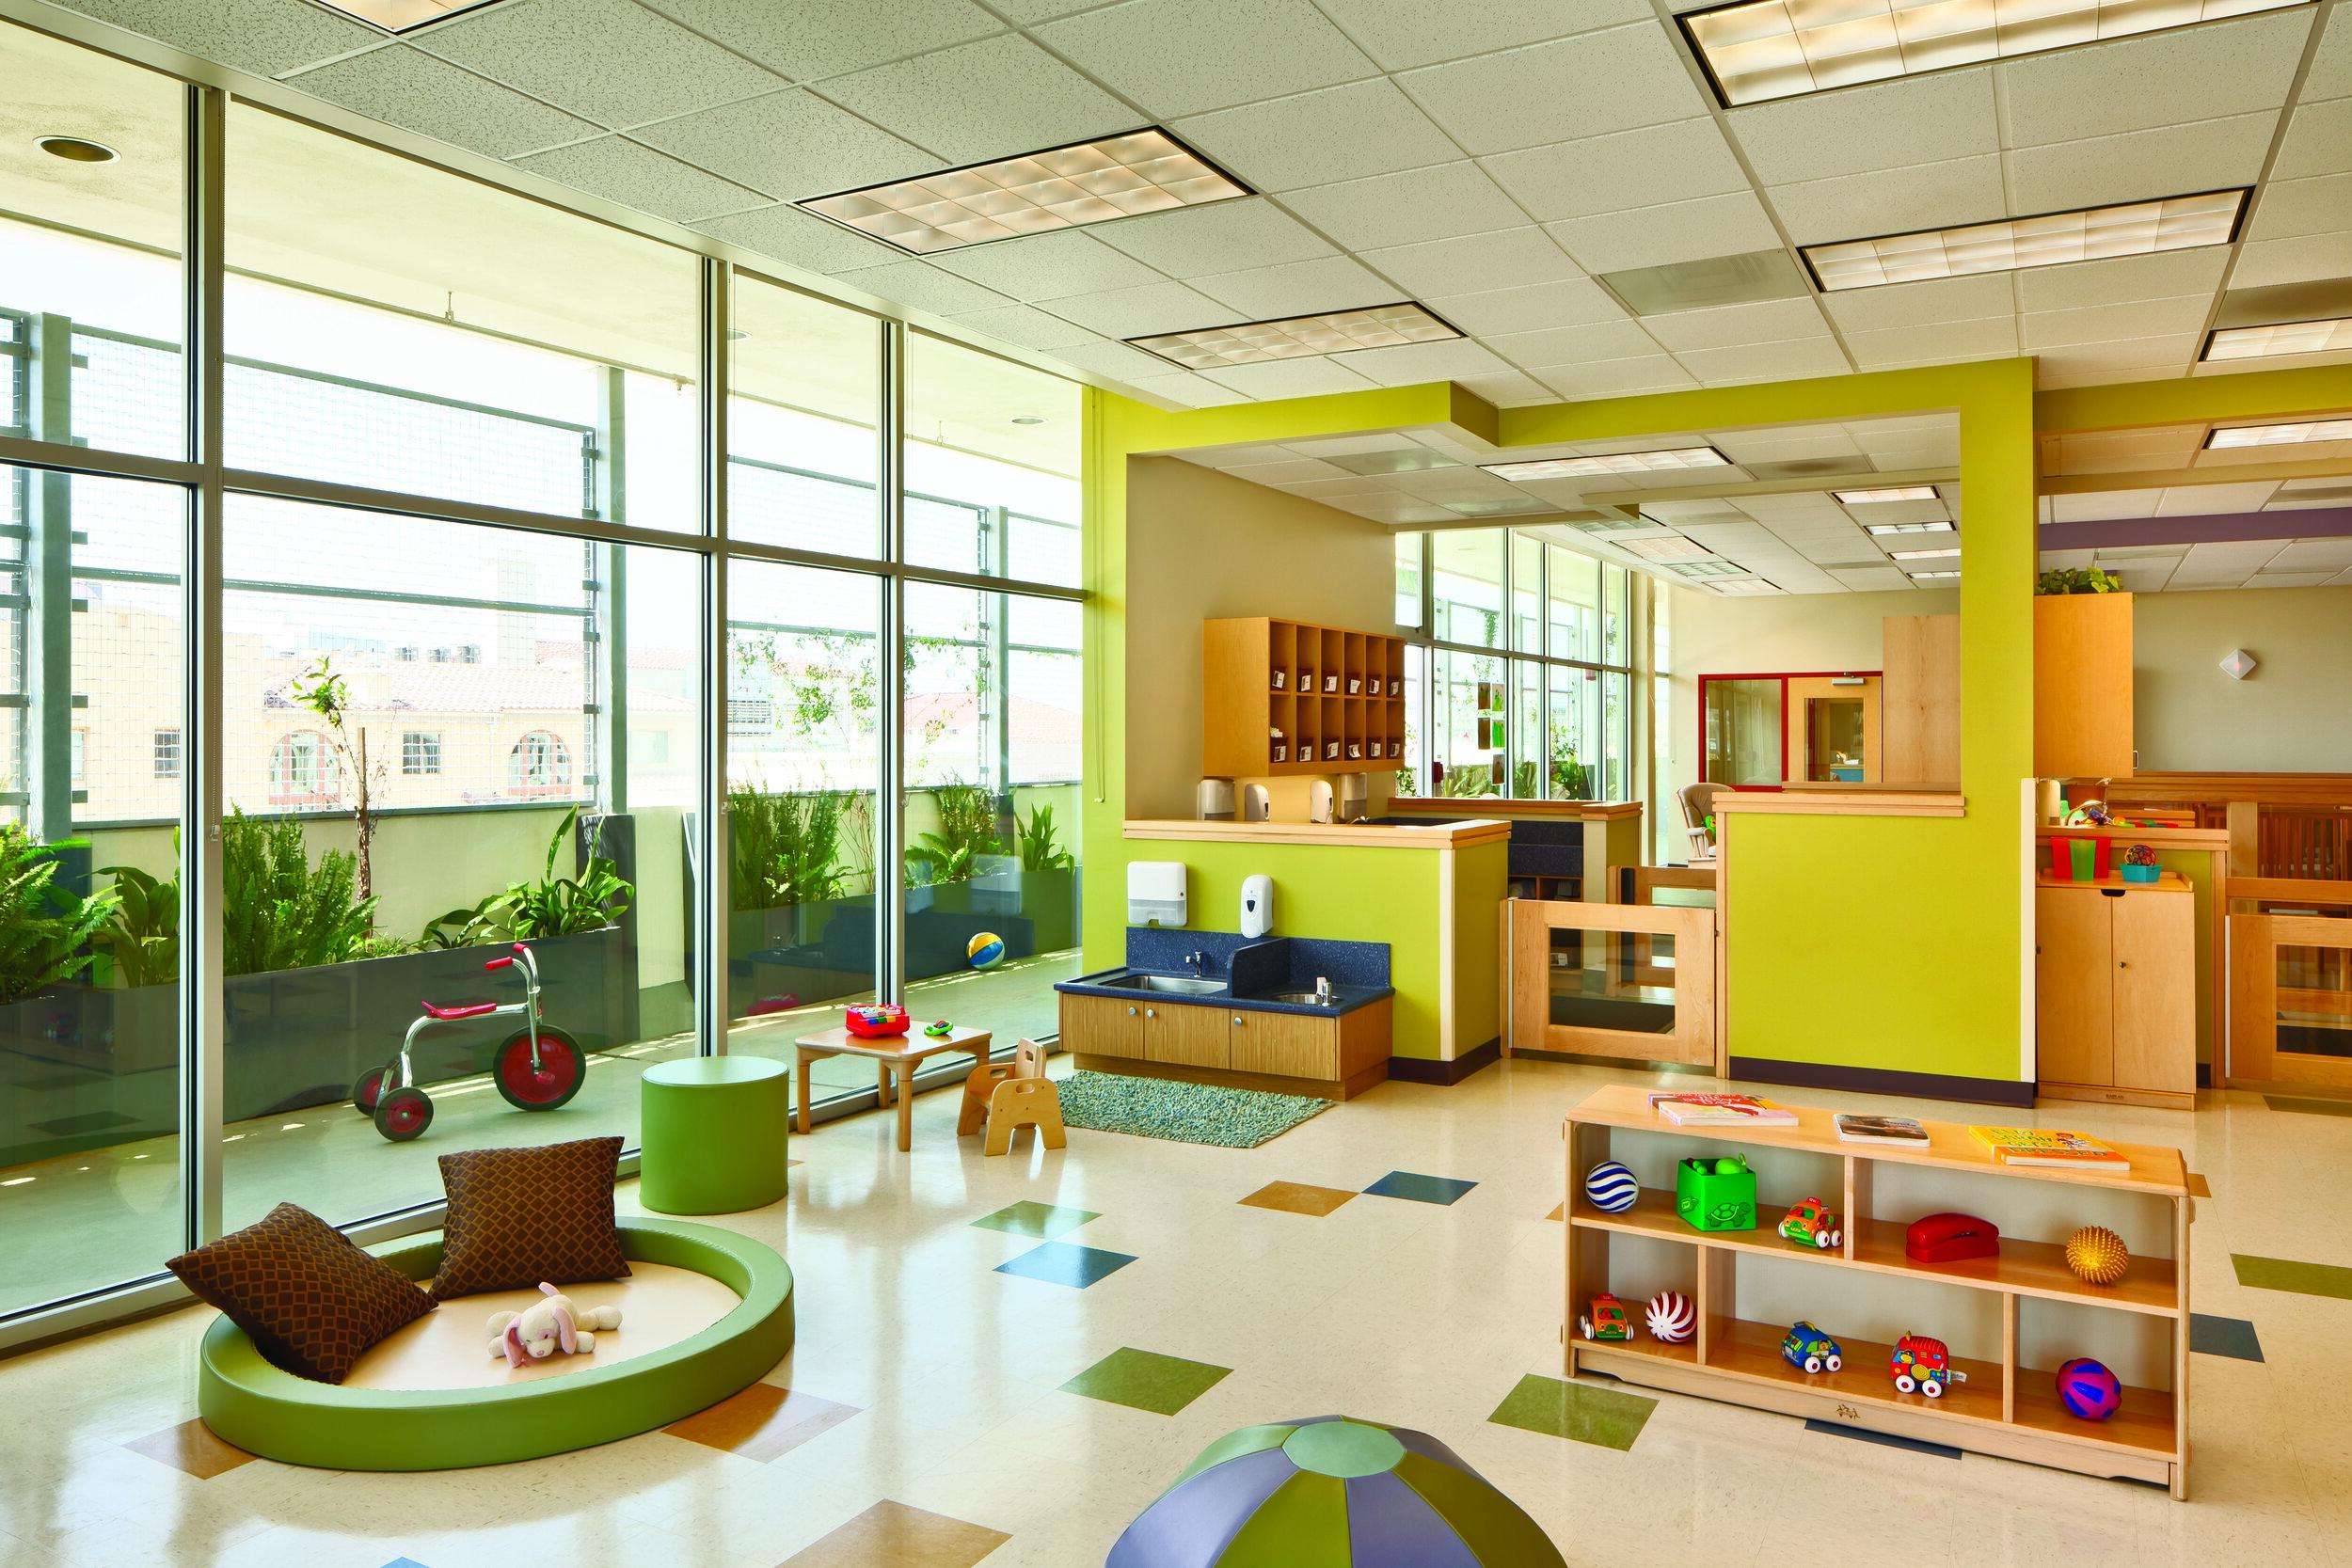 UCLA_Toddler Classroom.jpg